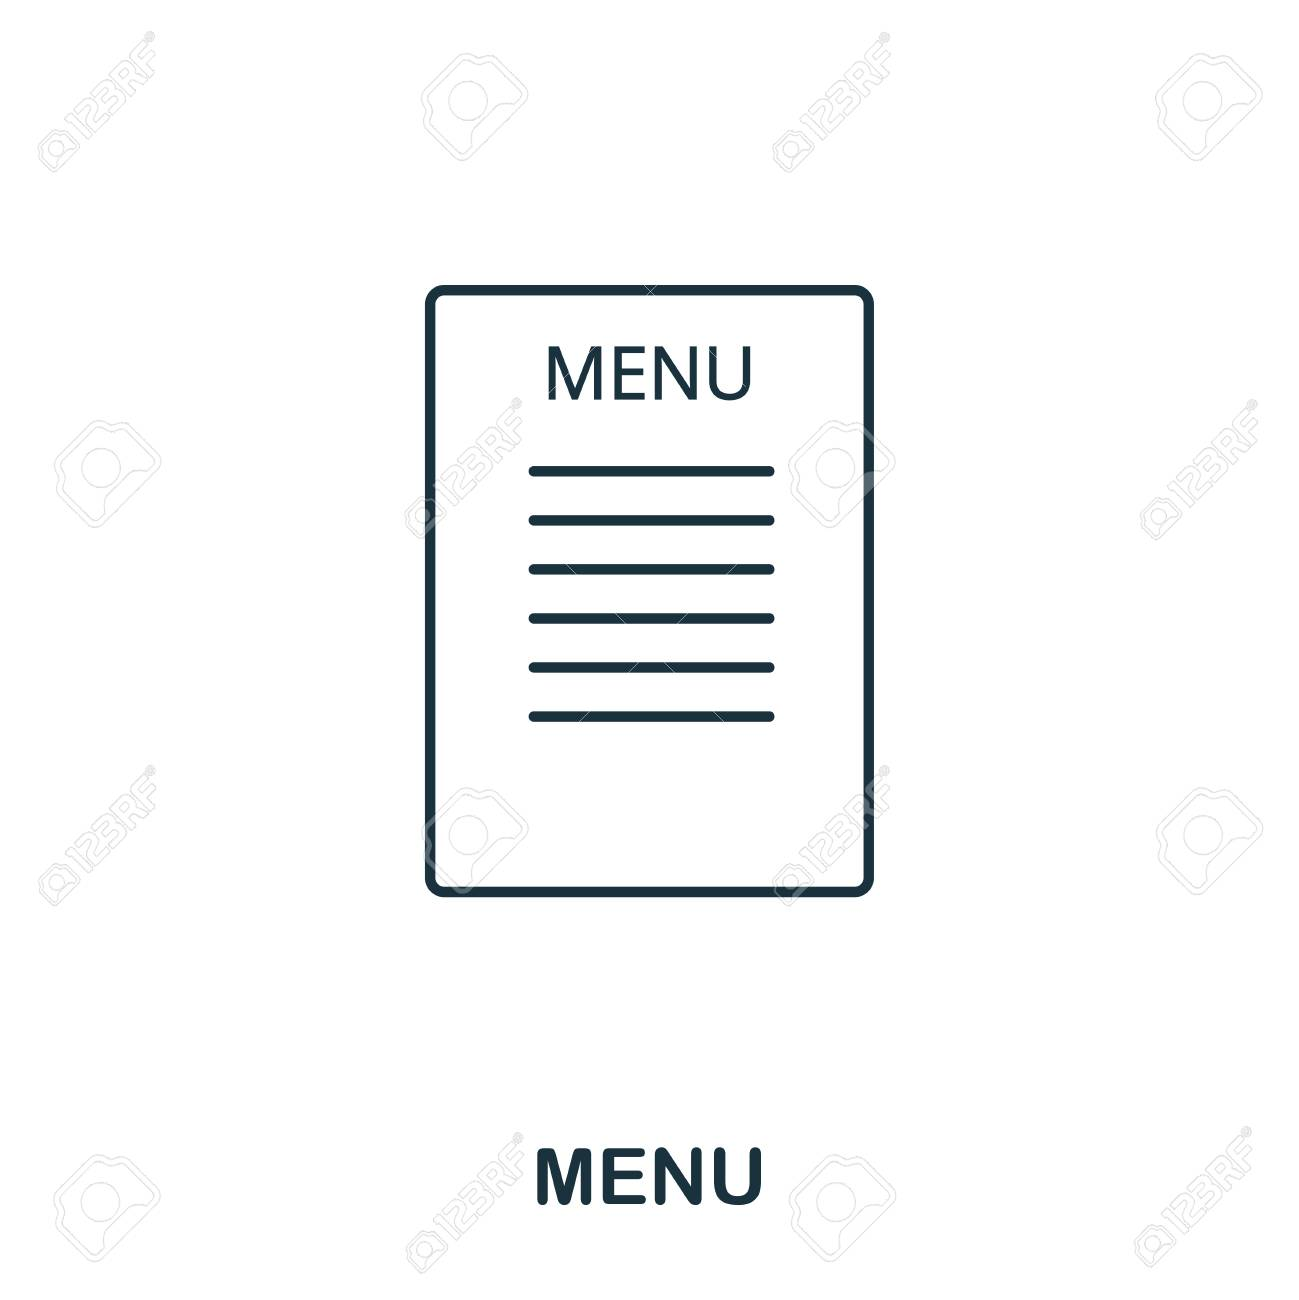 menu icon outline style icon design ui illustration of menu icon